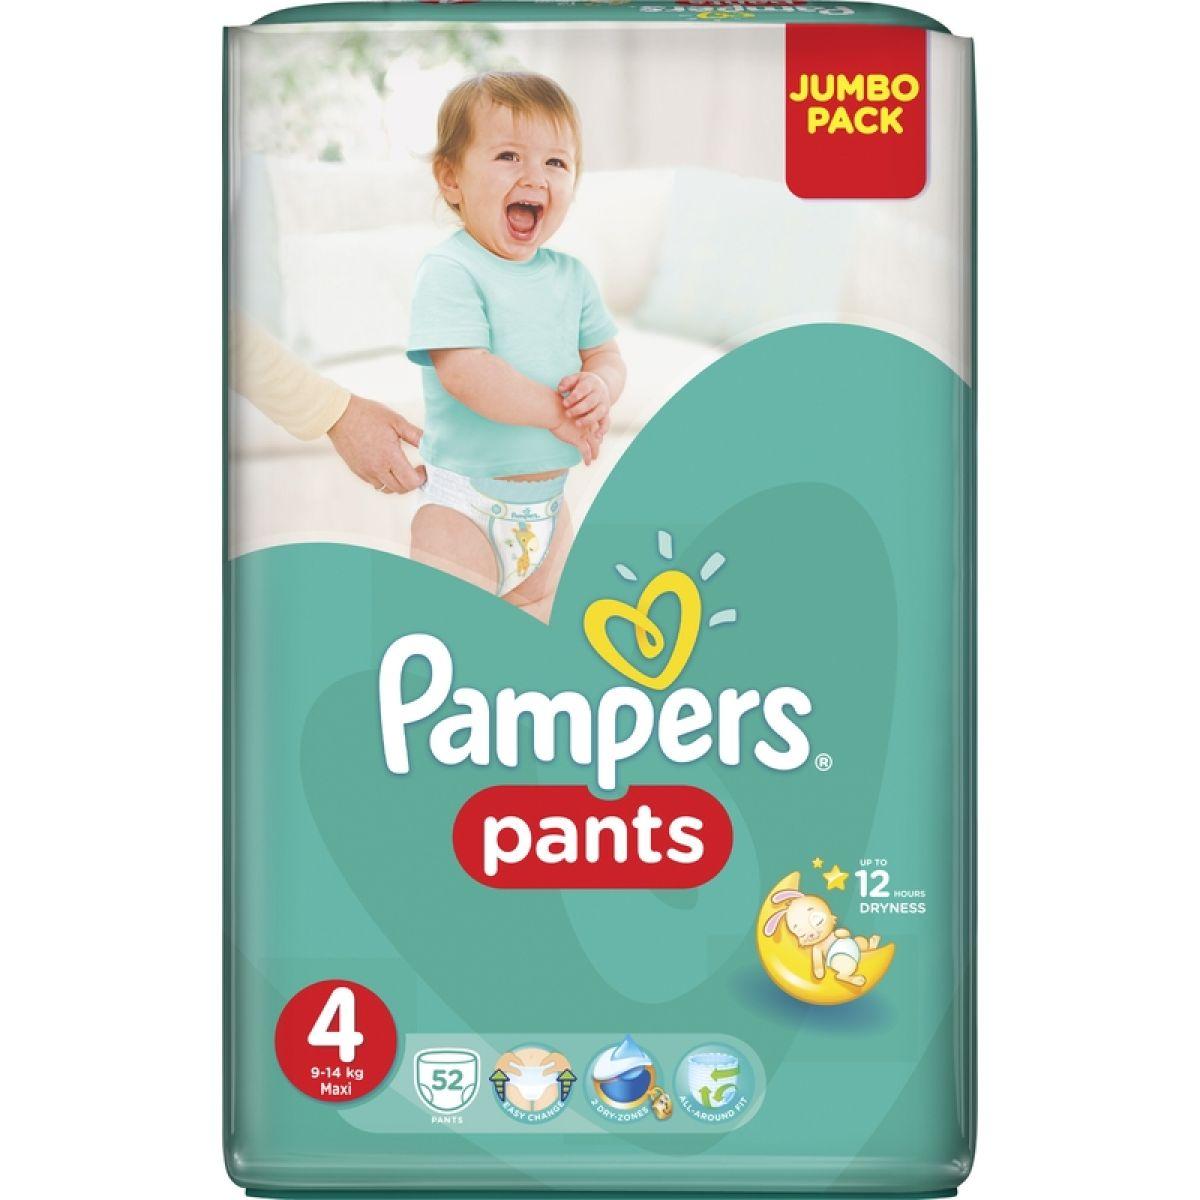 Pampers Pants Maxi 9 14kg Jumbo Pack S4 52ks